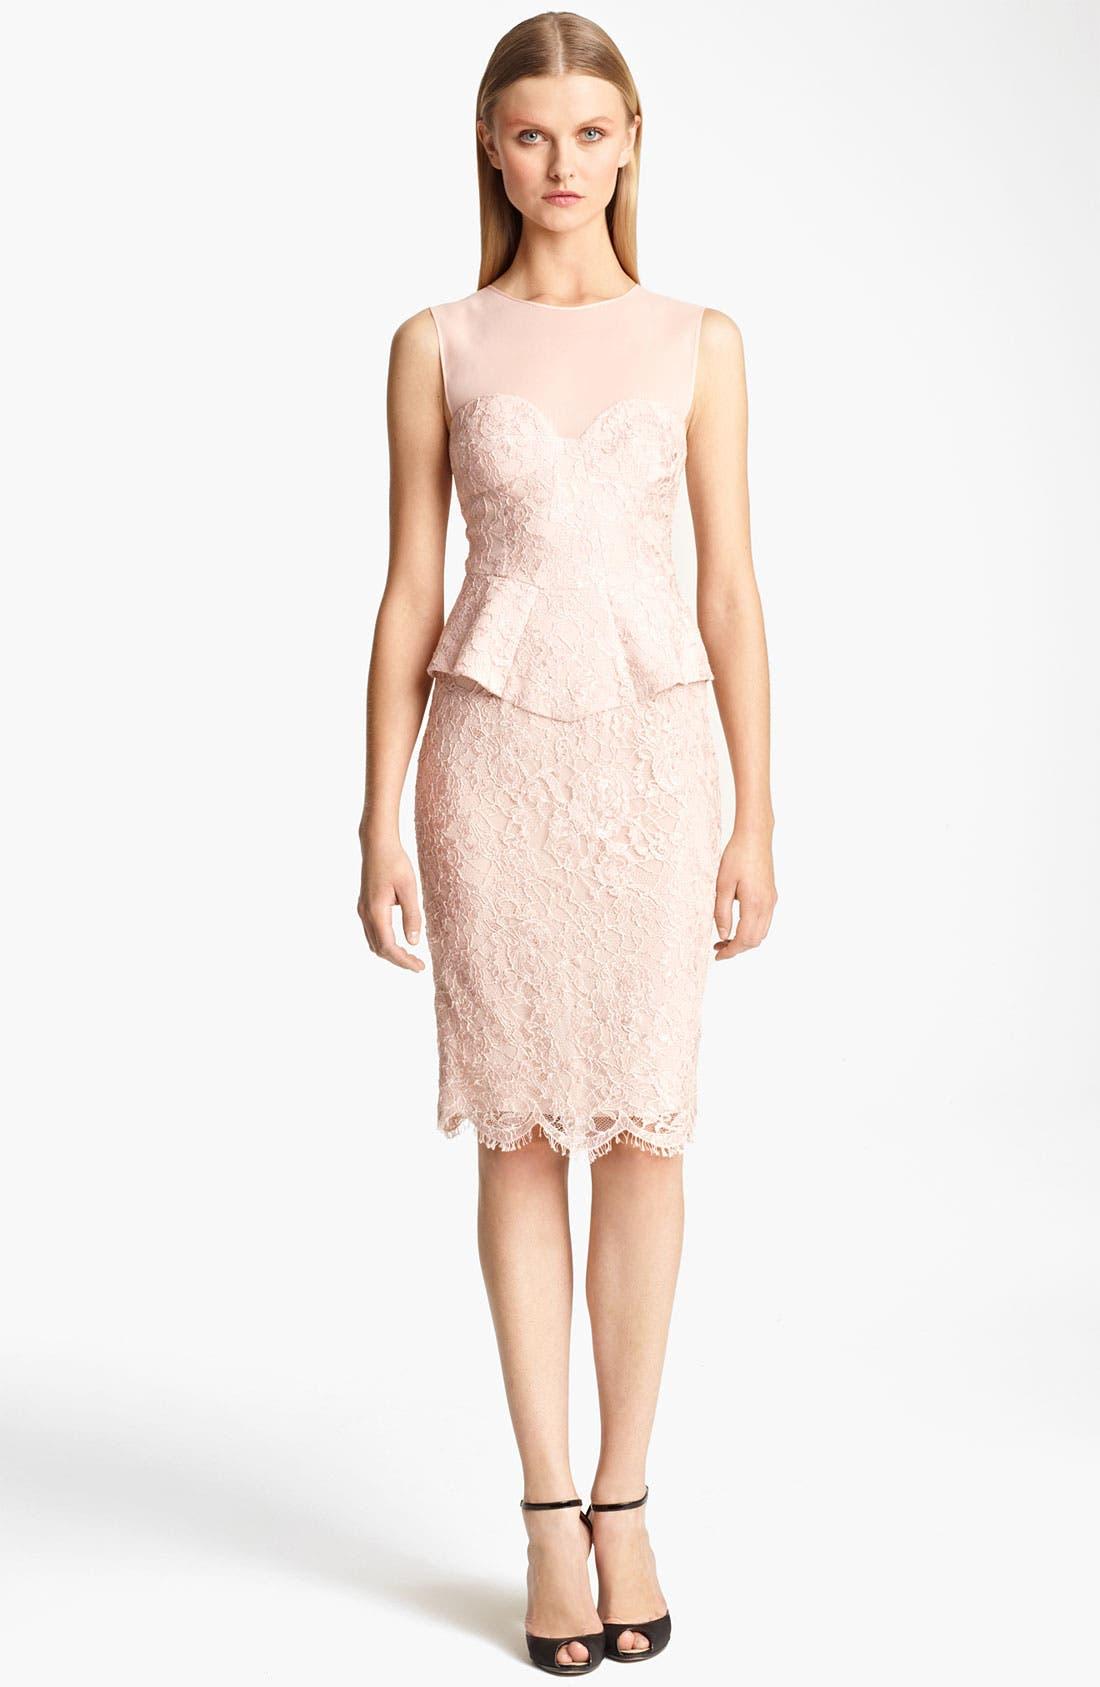 Main Image - Emilio Pucci Peplum Lace Dress